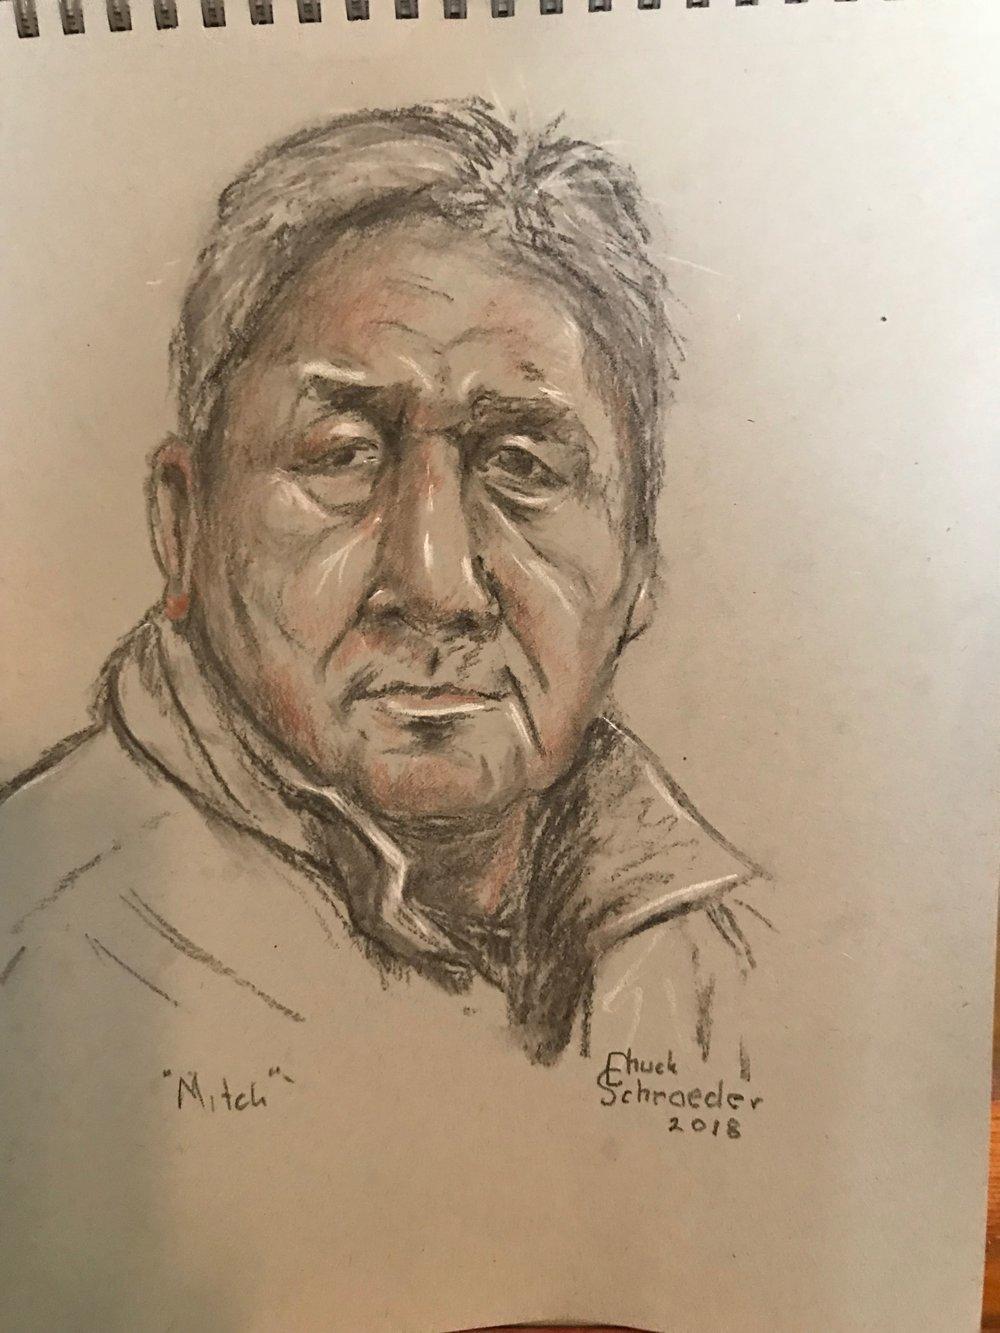 Chuck Schroeder - Mitch Parker small drawing.JPG